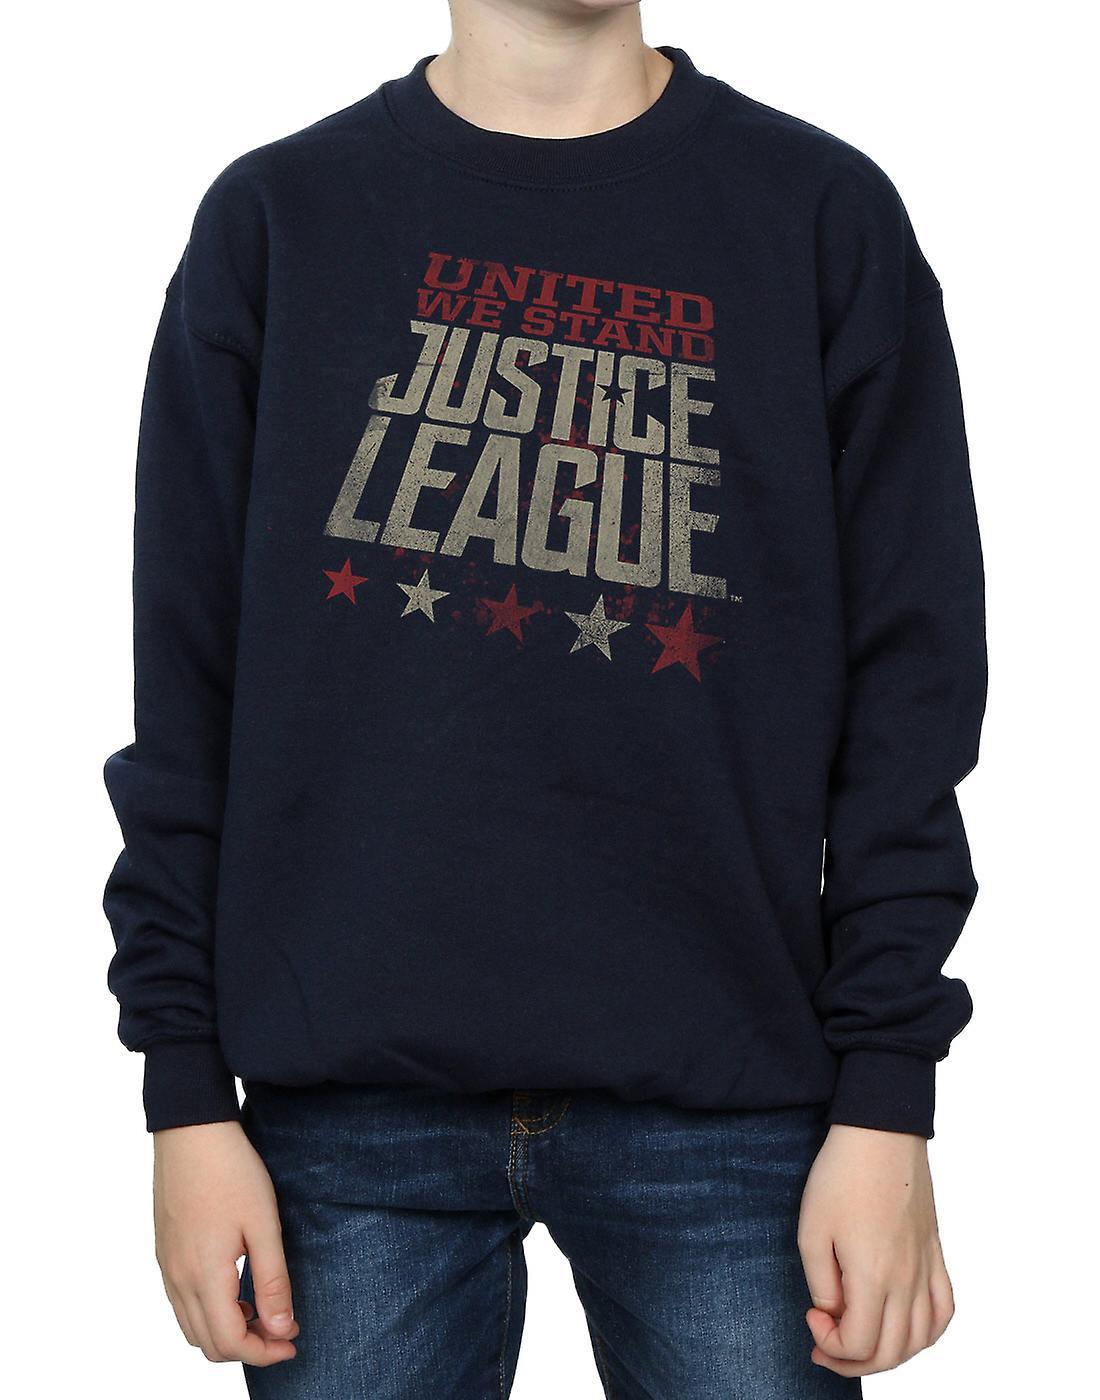 DC Comics pojkar Justice League film enade vi stå Sweatshirt